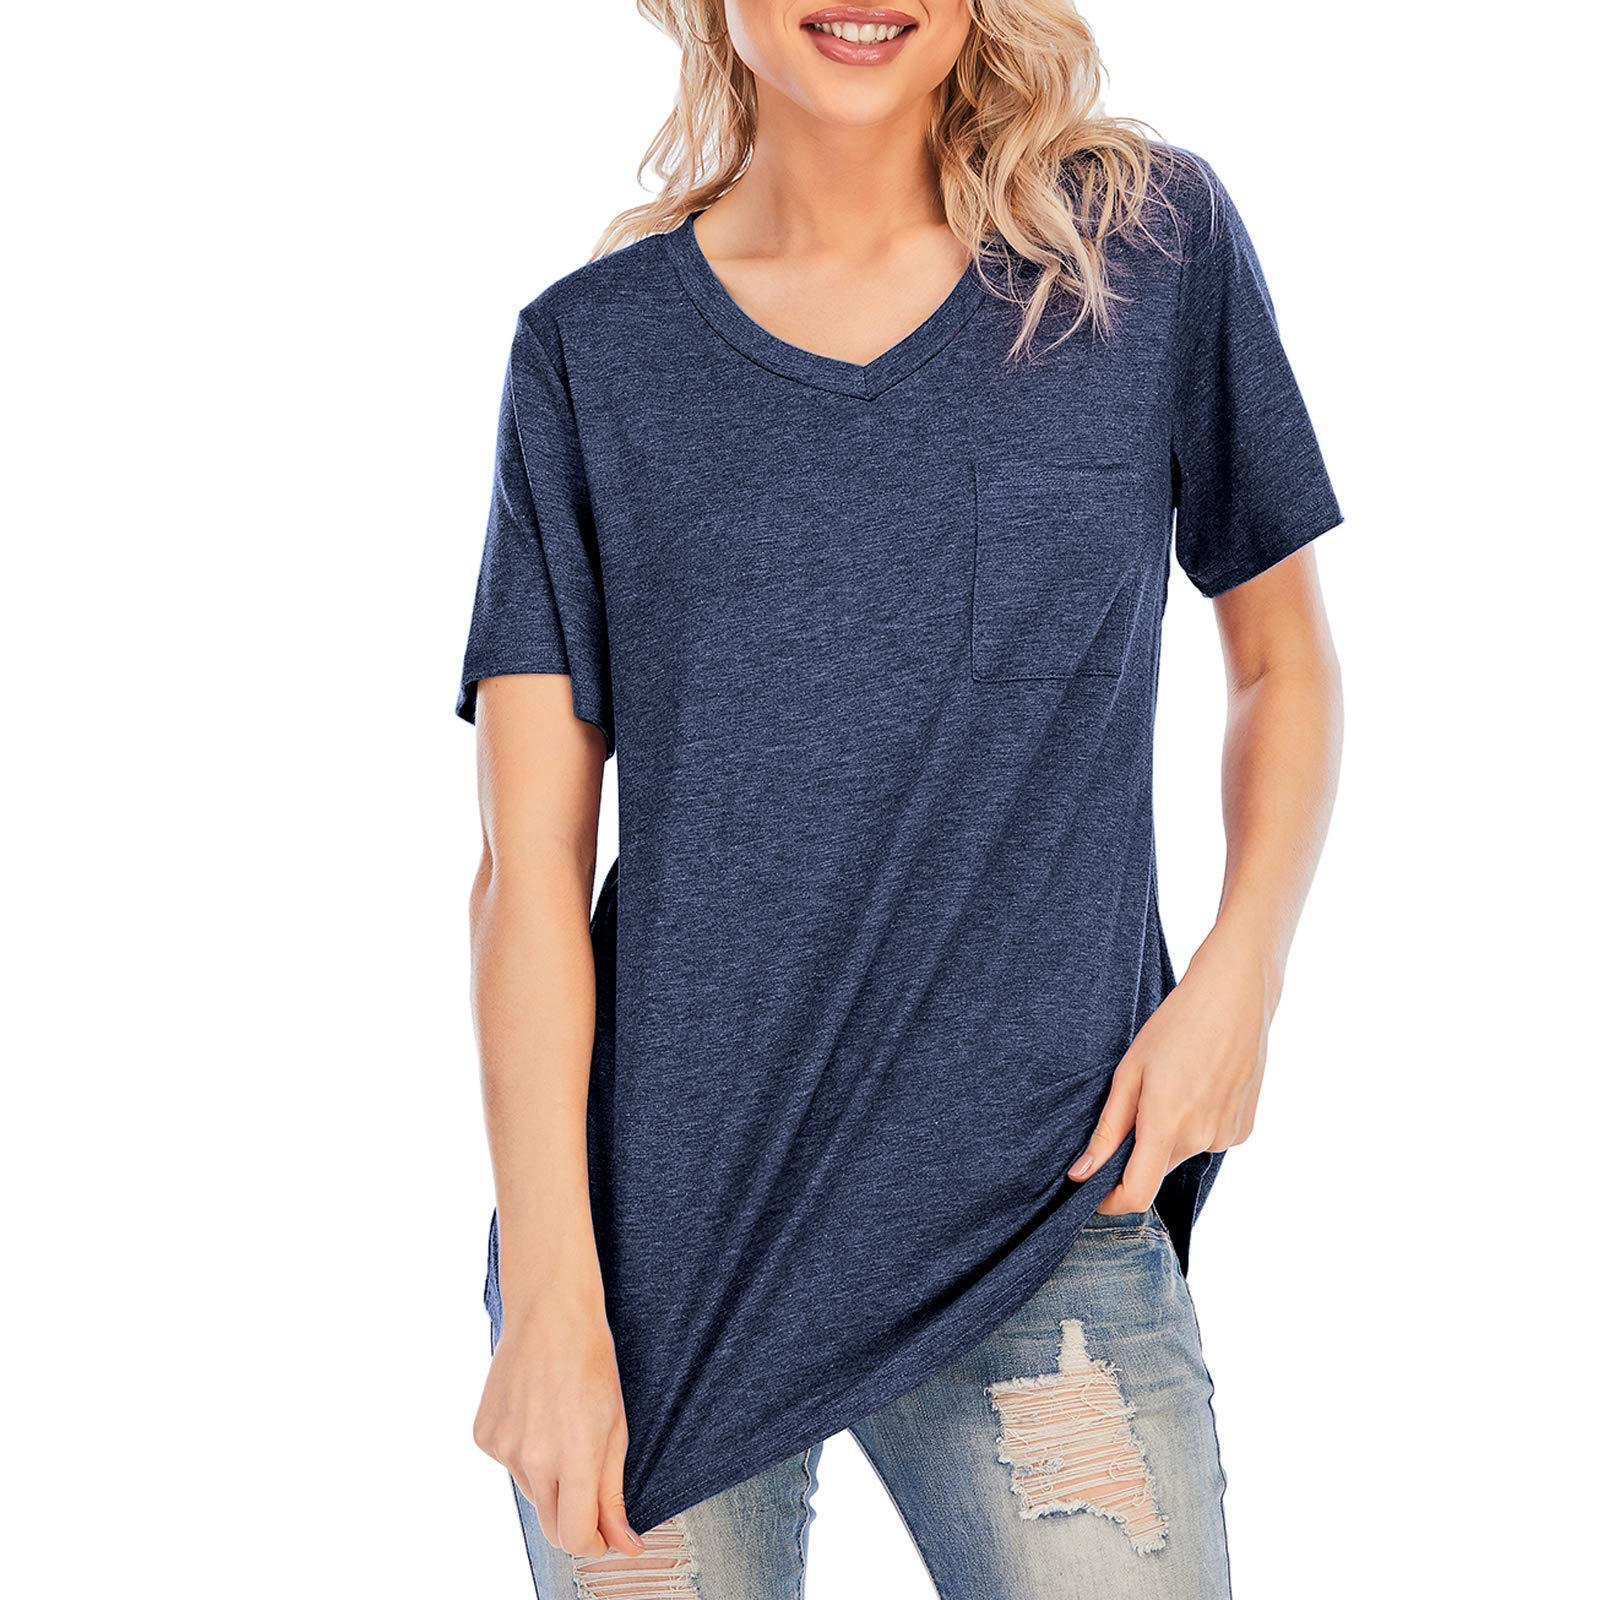 Women Casual Twist Knot Tunic Crew Neck Short Sleeve T Shirts Soft